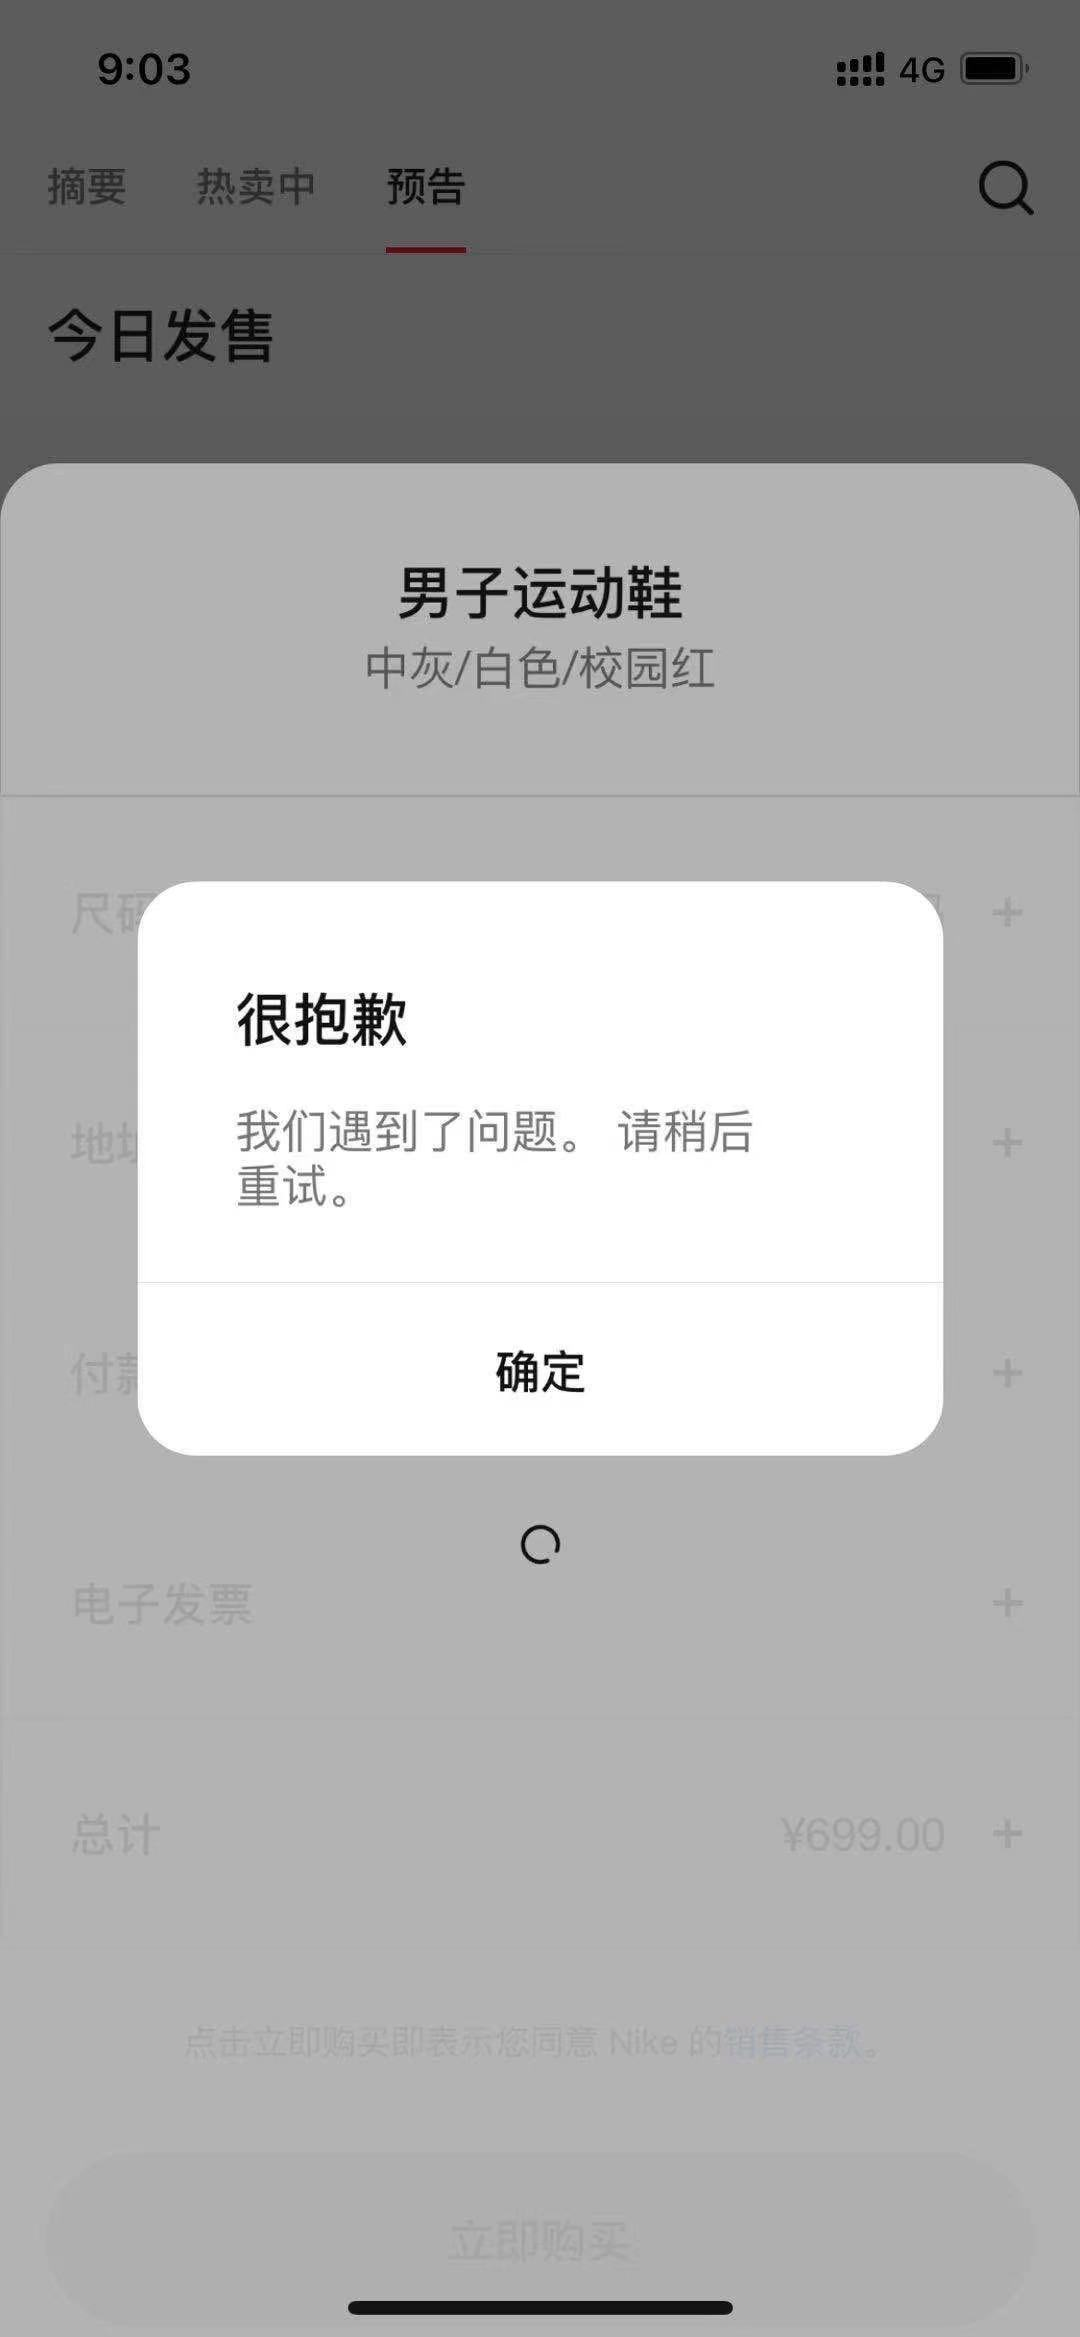 Nike,SNKRS,DD1391-002,DD1391-1  SNKRS 疯狂抱歉上热搜!「熊猫」「小 OW」今早发售遇瘫痪!